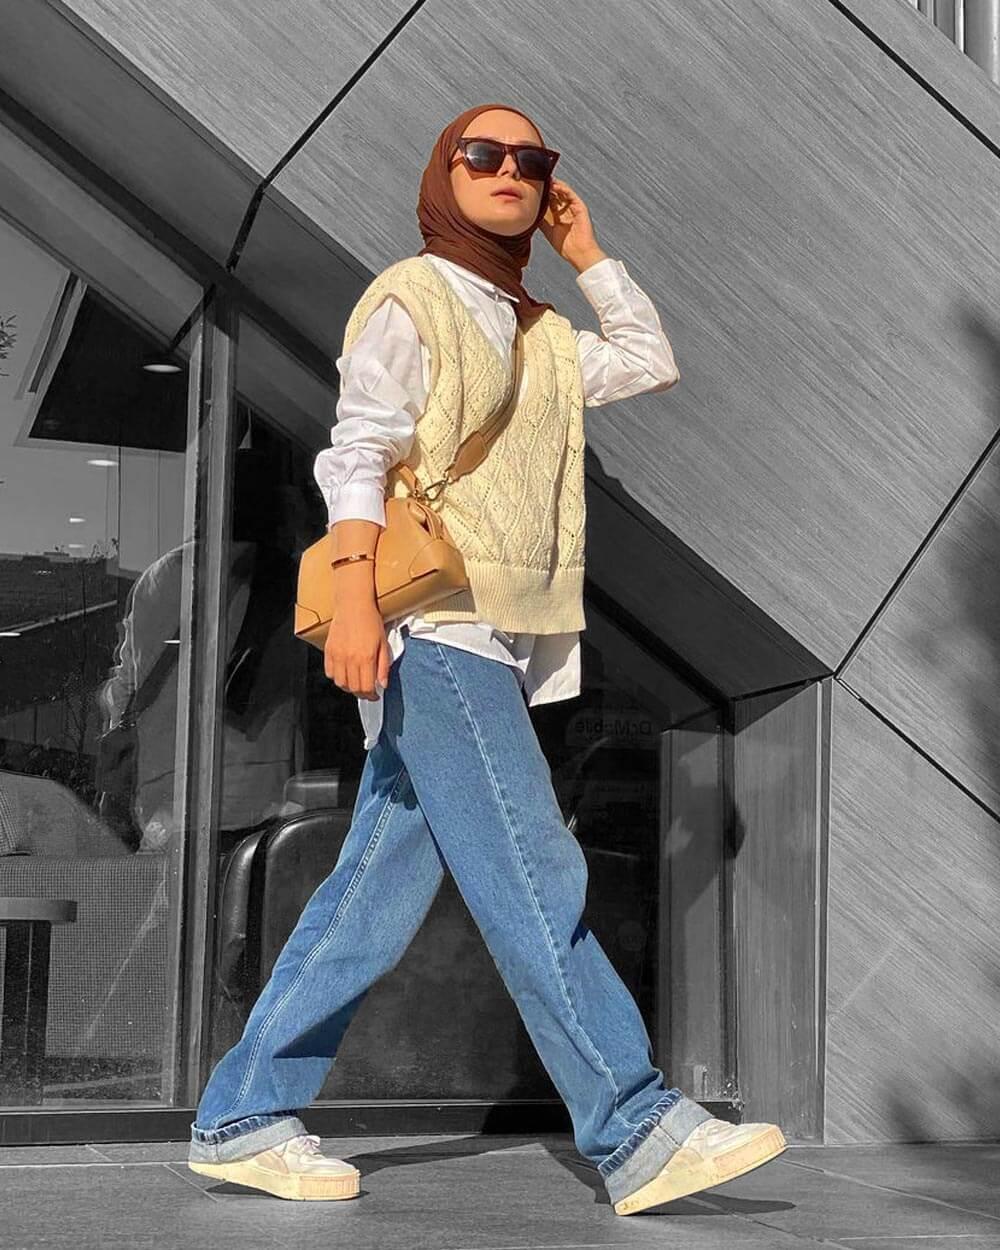 Vest fashion trends of 2021